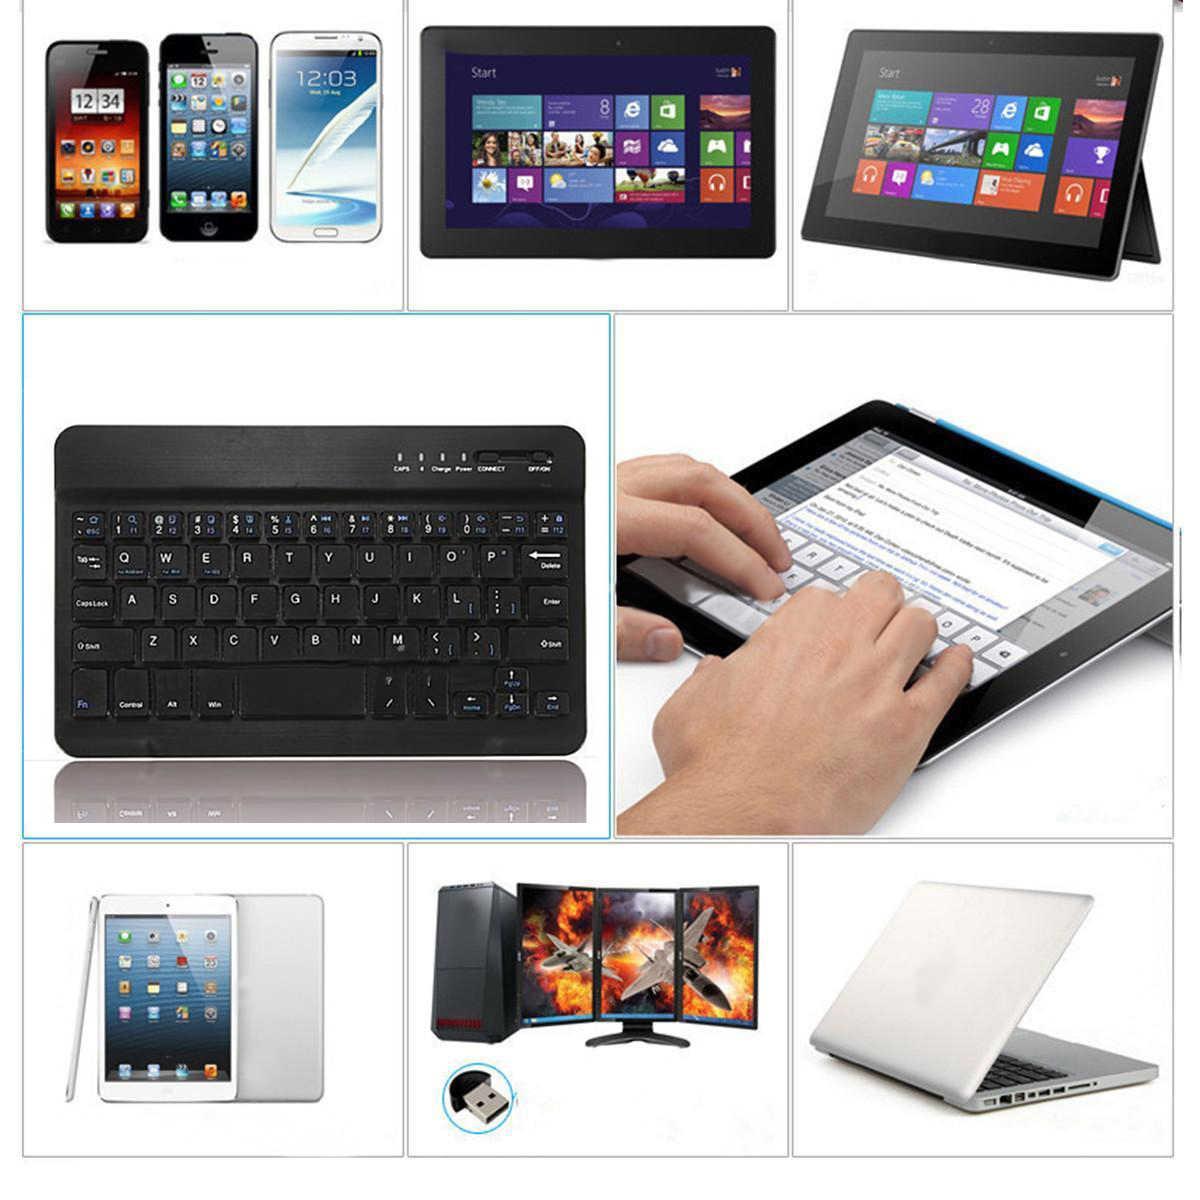 59 Tombol Logam Aluminium Wireless Bluetooth 3.0 Mini Keyboard untuk Mac IOS Android Windows PC Tablet Ponsel Pintar Notebook Desktop